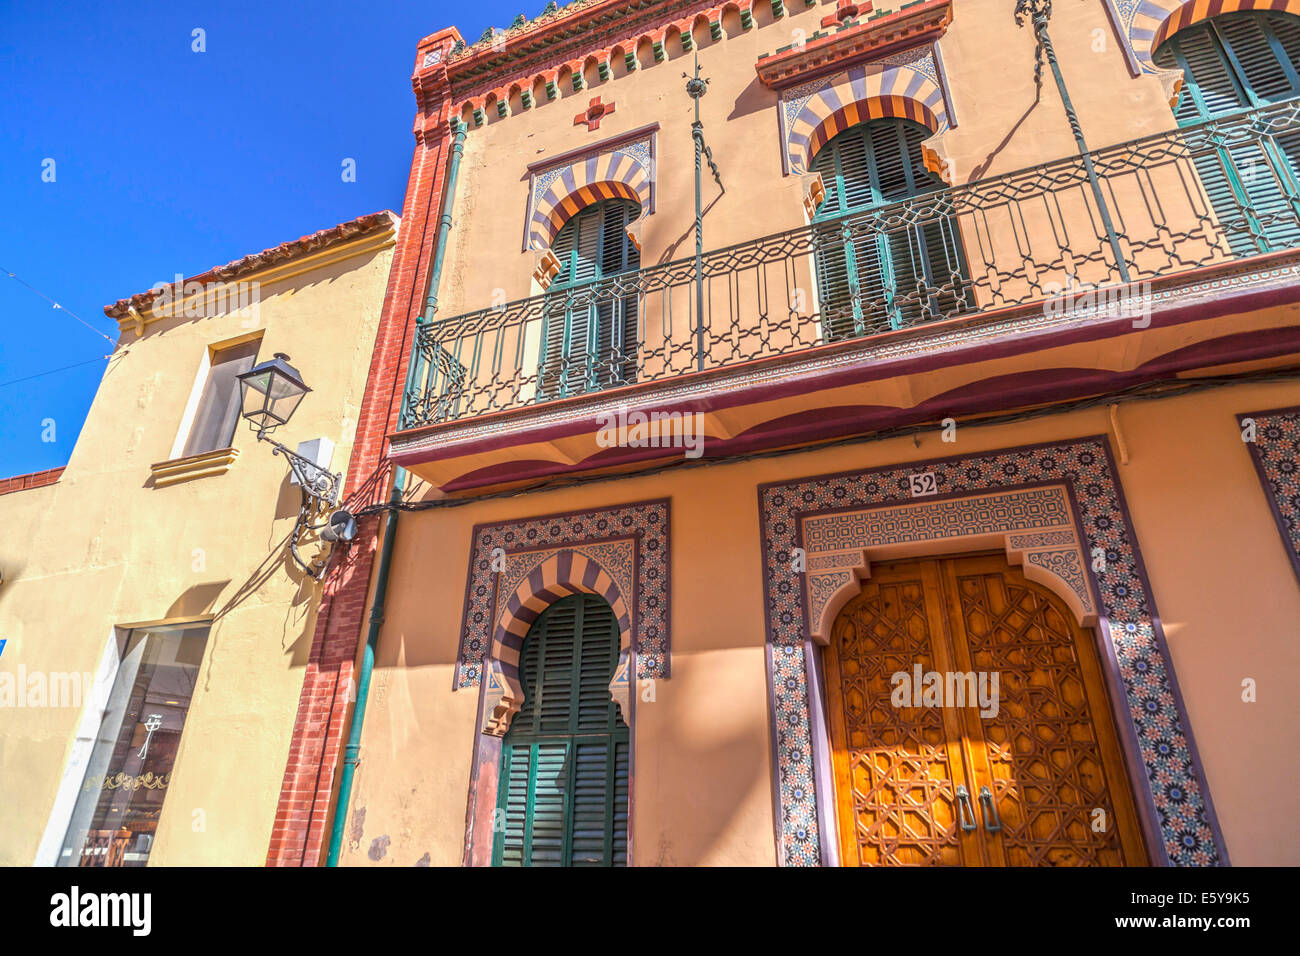 Vilassar de mar,Catalonia,Spain - Stock Image